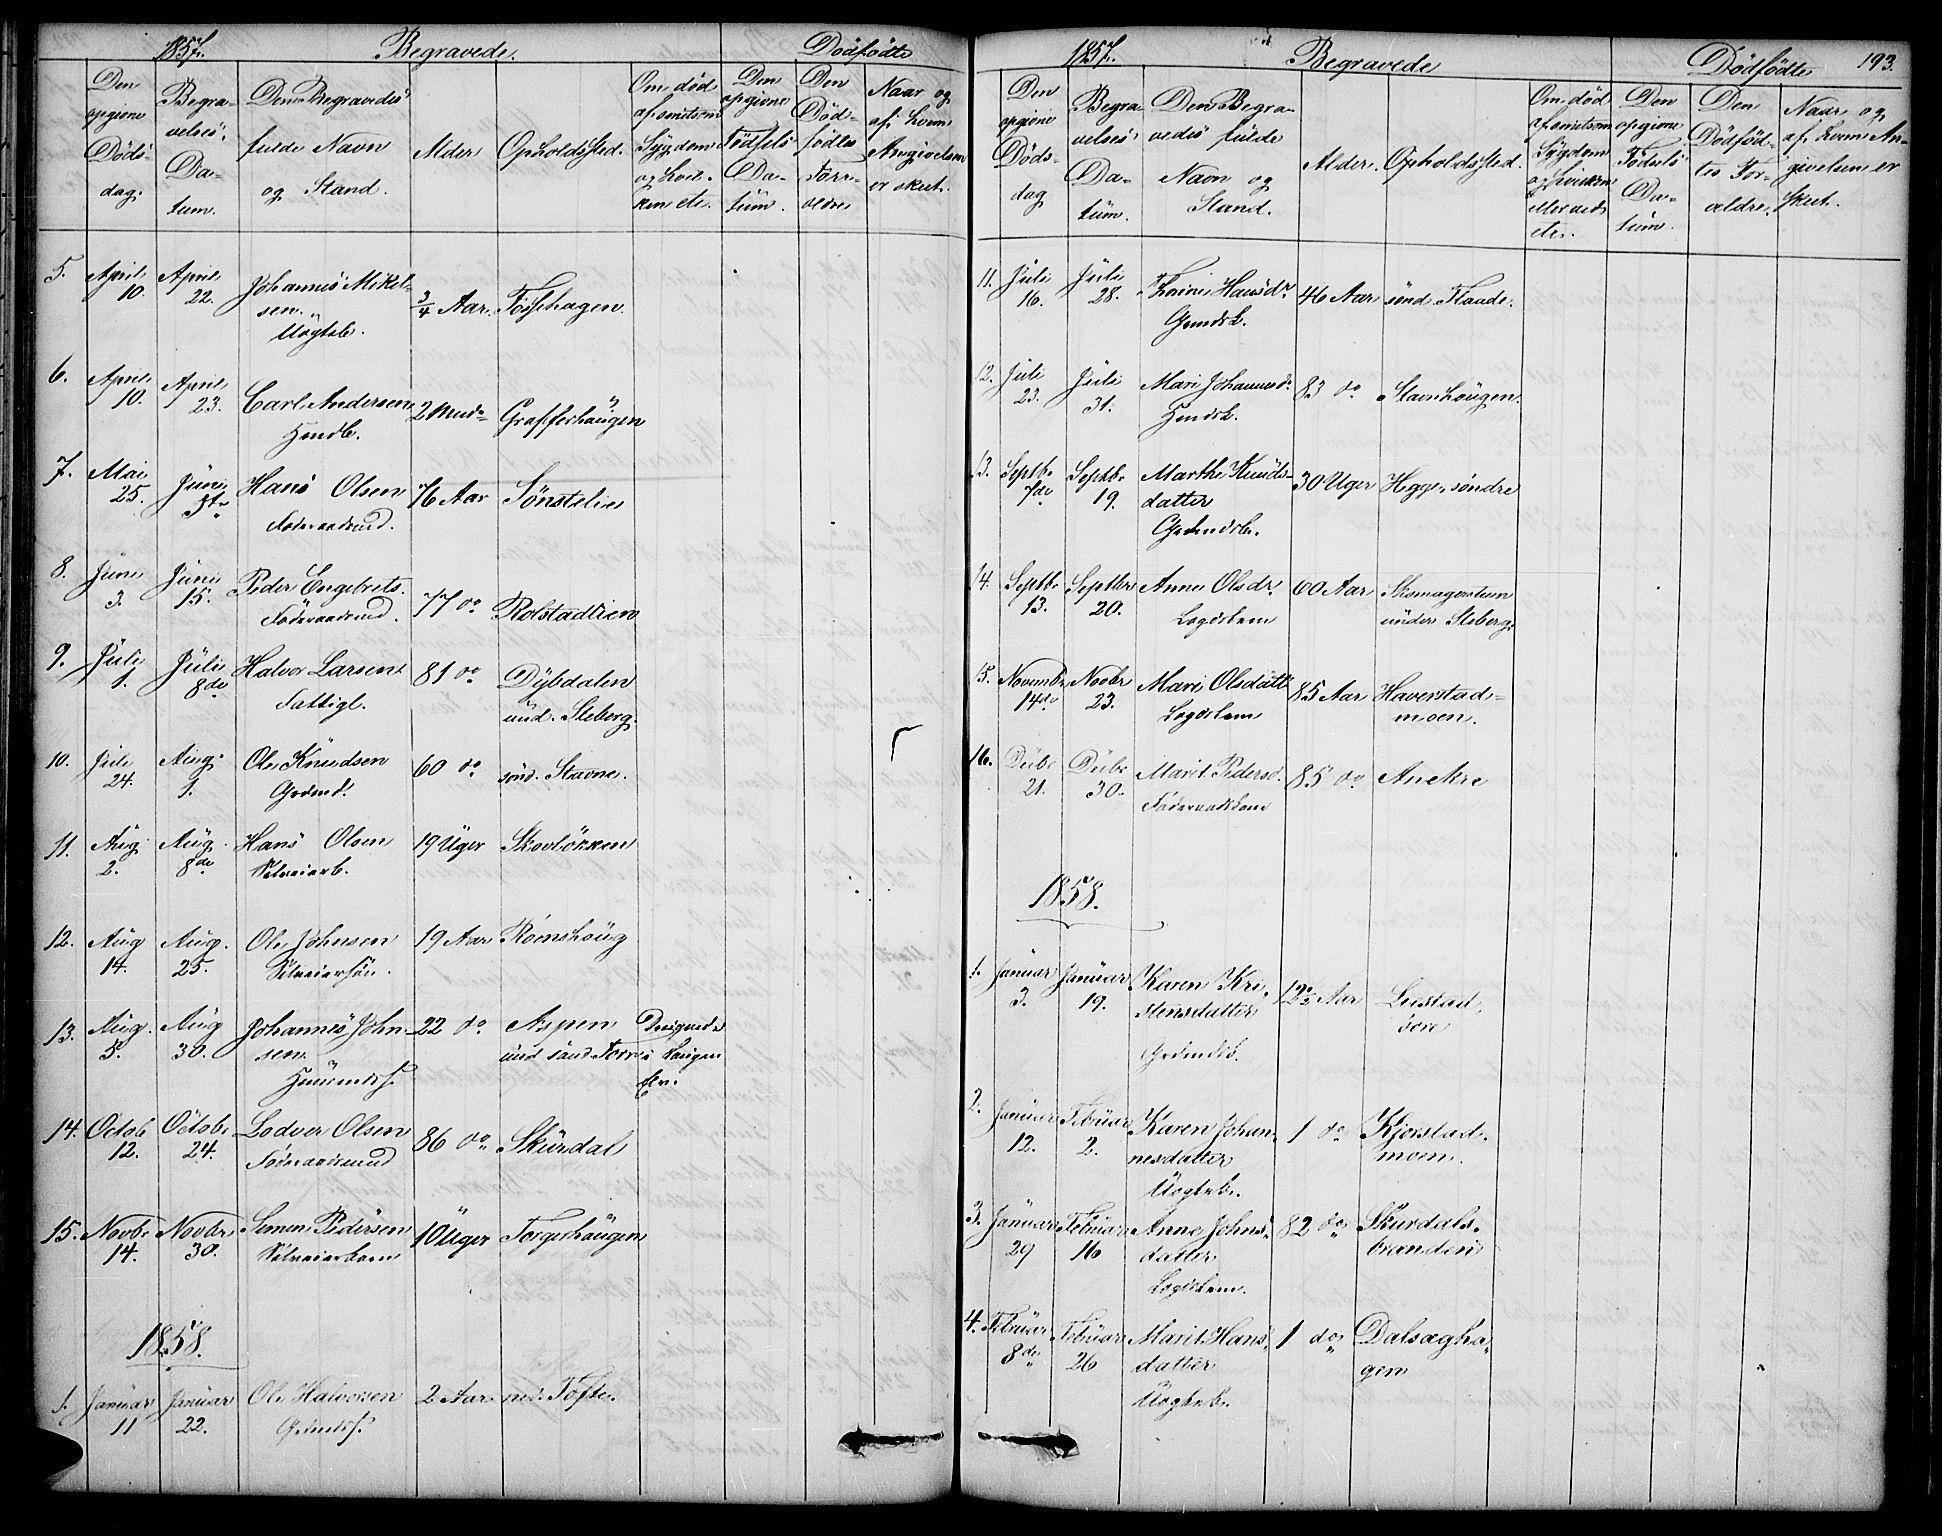 SAH, Sør-Fron prestekontor, H/Ha/Hab/L0001: Klokkerbok nr. 1, 1844-1863, s. 193